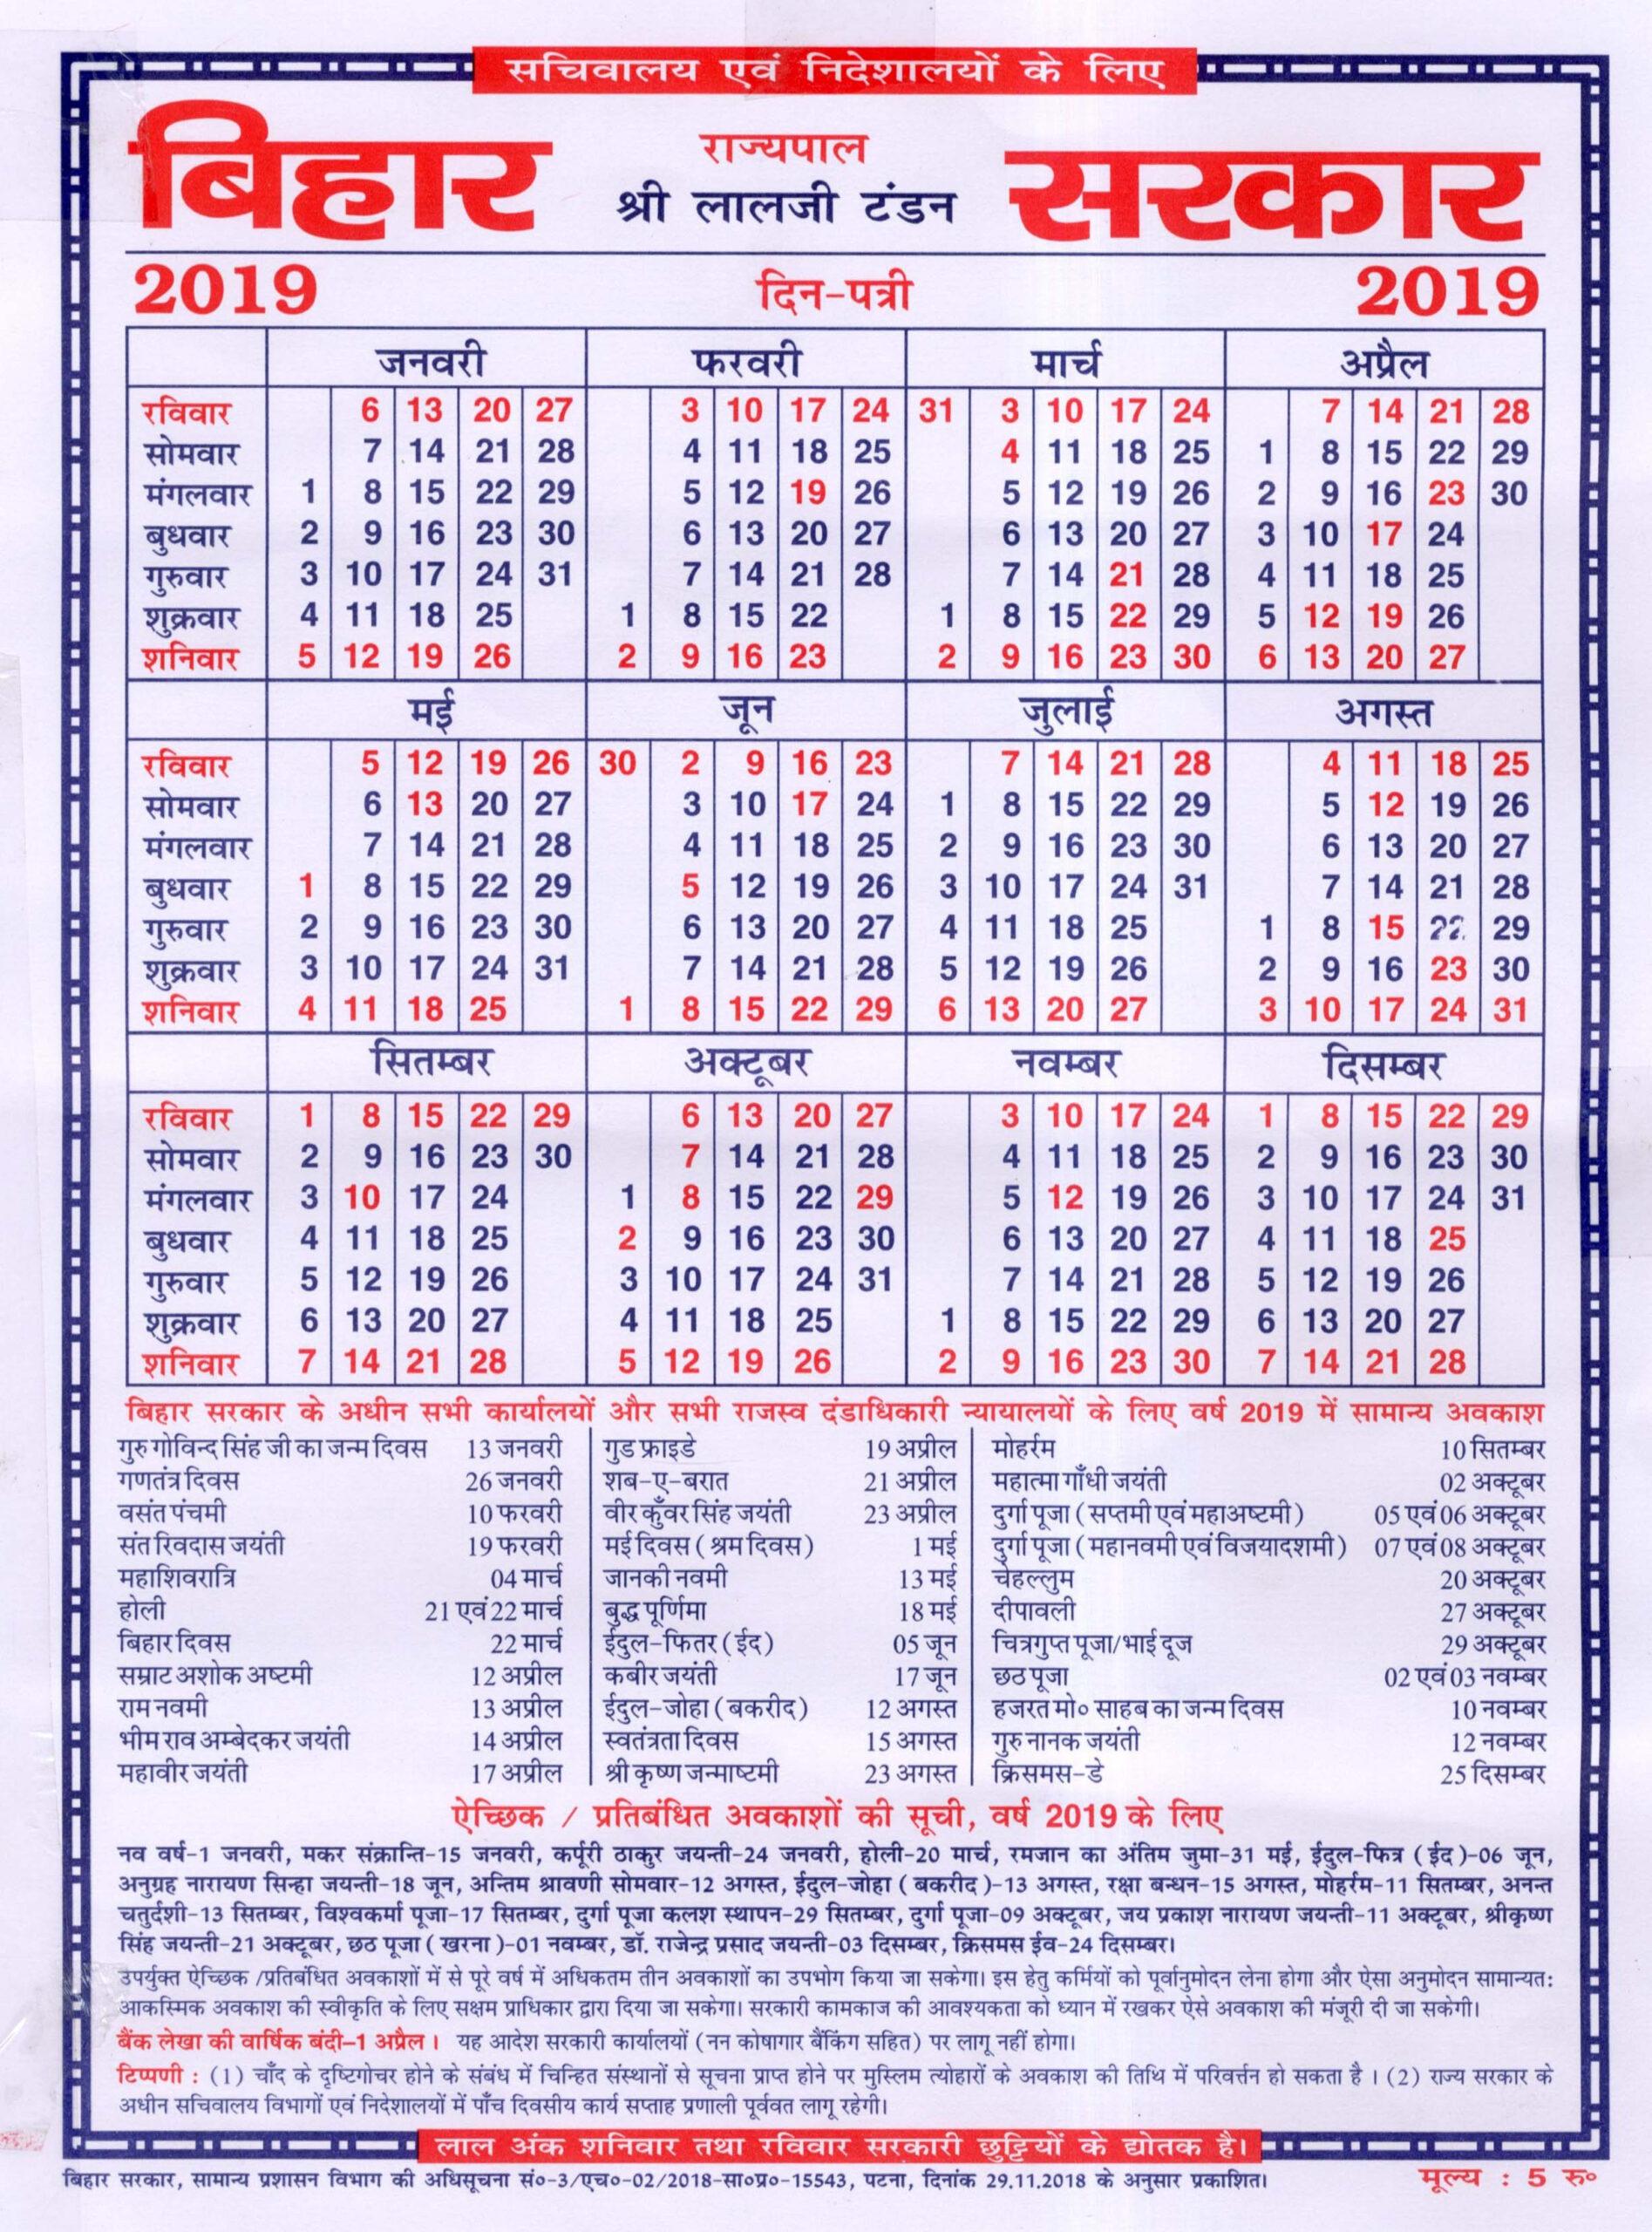 Bihar Sarkar Clender | Calendar For Planning in Calendar 2018 Bihar Sarkar